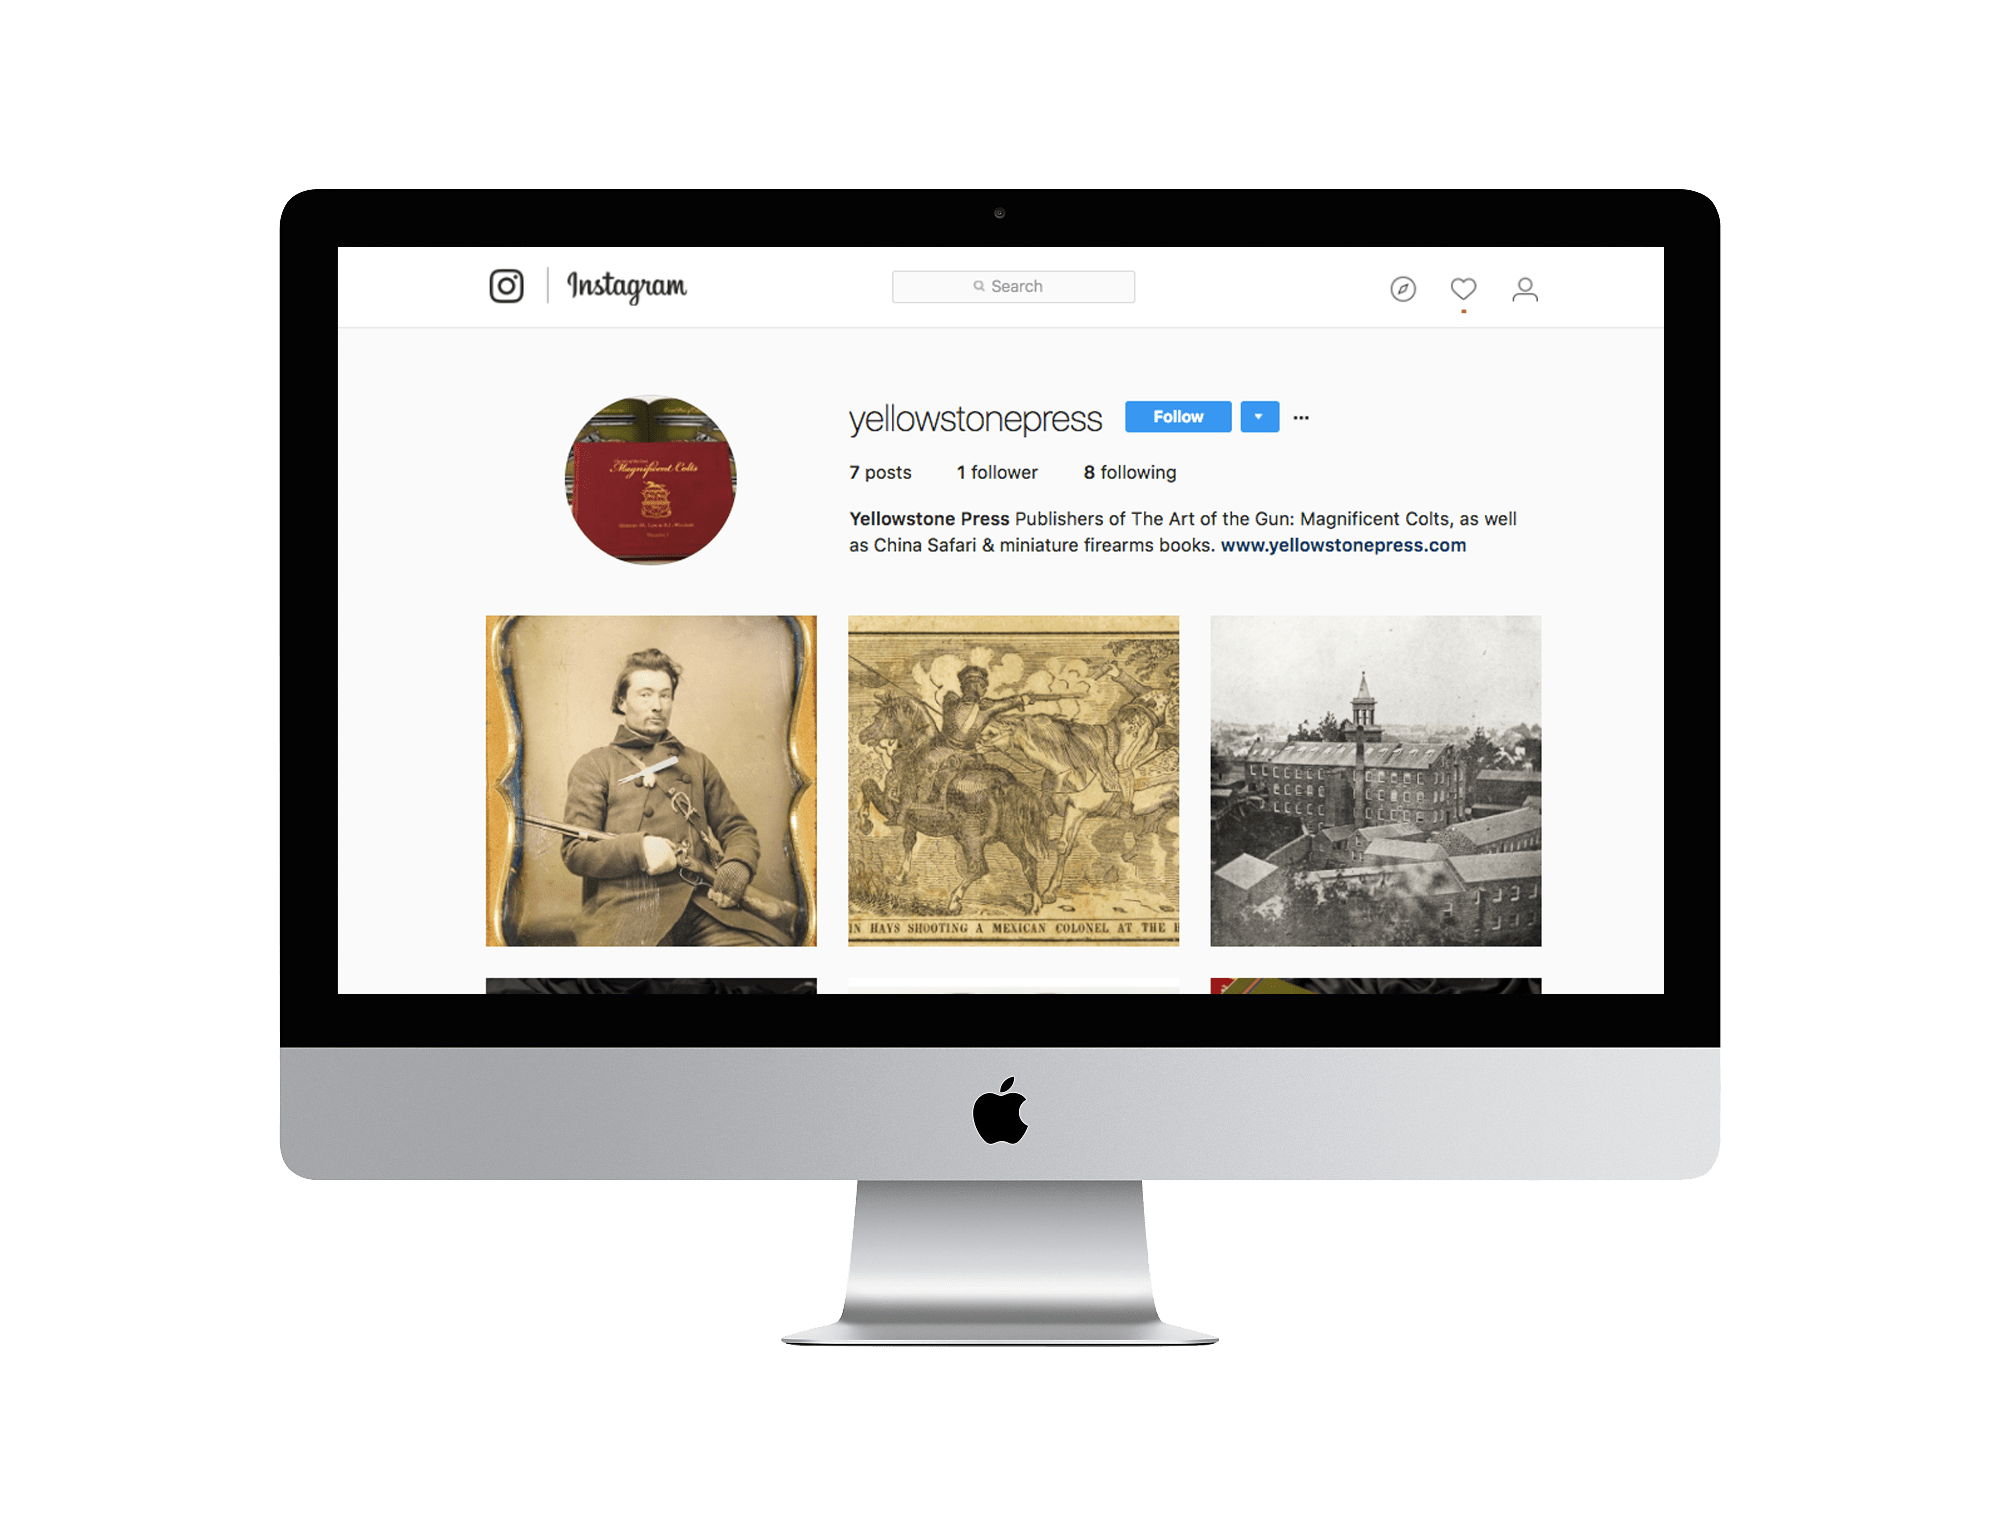 Yellowstone Press Instagram